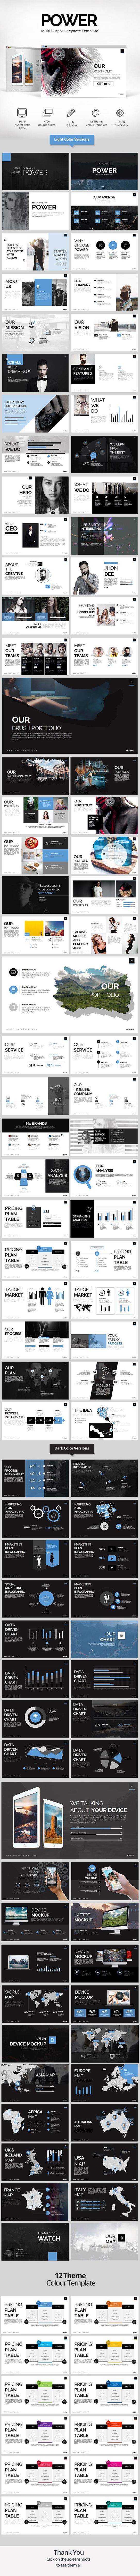 Power Keynote Templates - Keynote Templates Presentation Templates